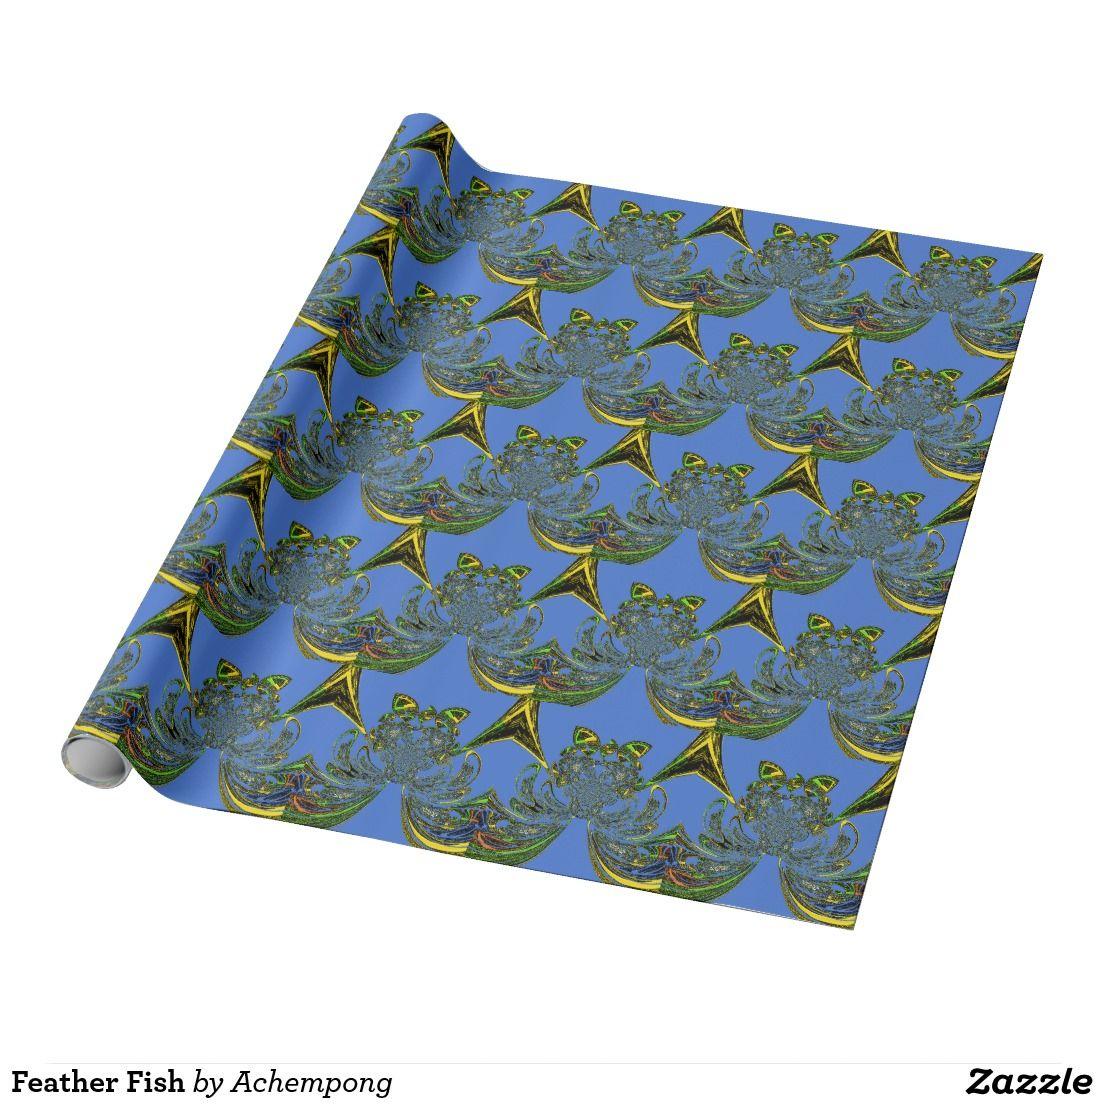 Feather Fish #Hakuna Matata beautiful #Fantastic Feminine Design Gifts - Shirts, Posters, Art, & more Gift Ideas